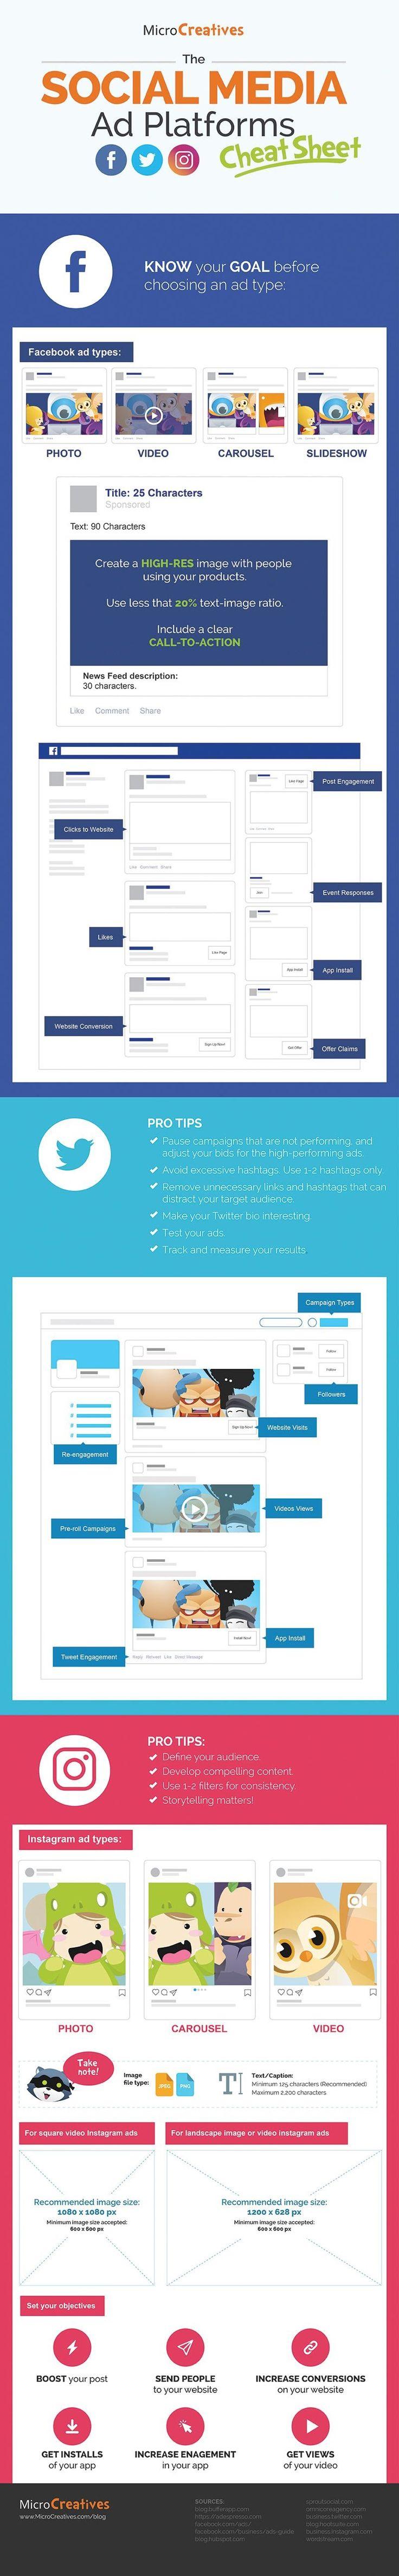 Facebook, Twitter, Instagram: The Social Media Ad Platforms Cheat Sheet (infographic) / Digital Information World